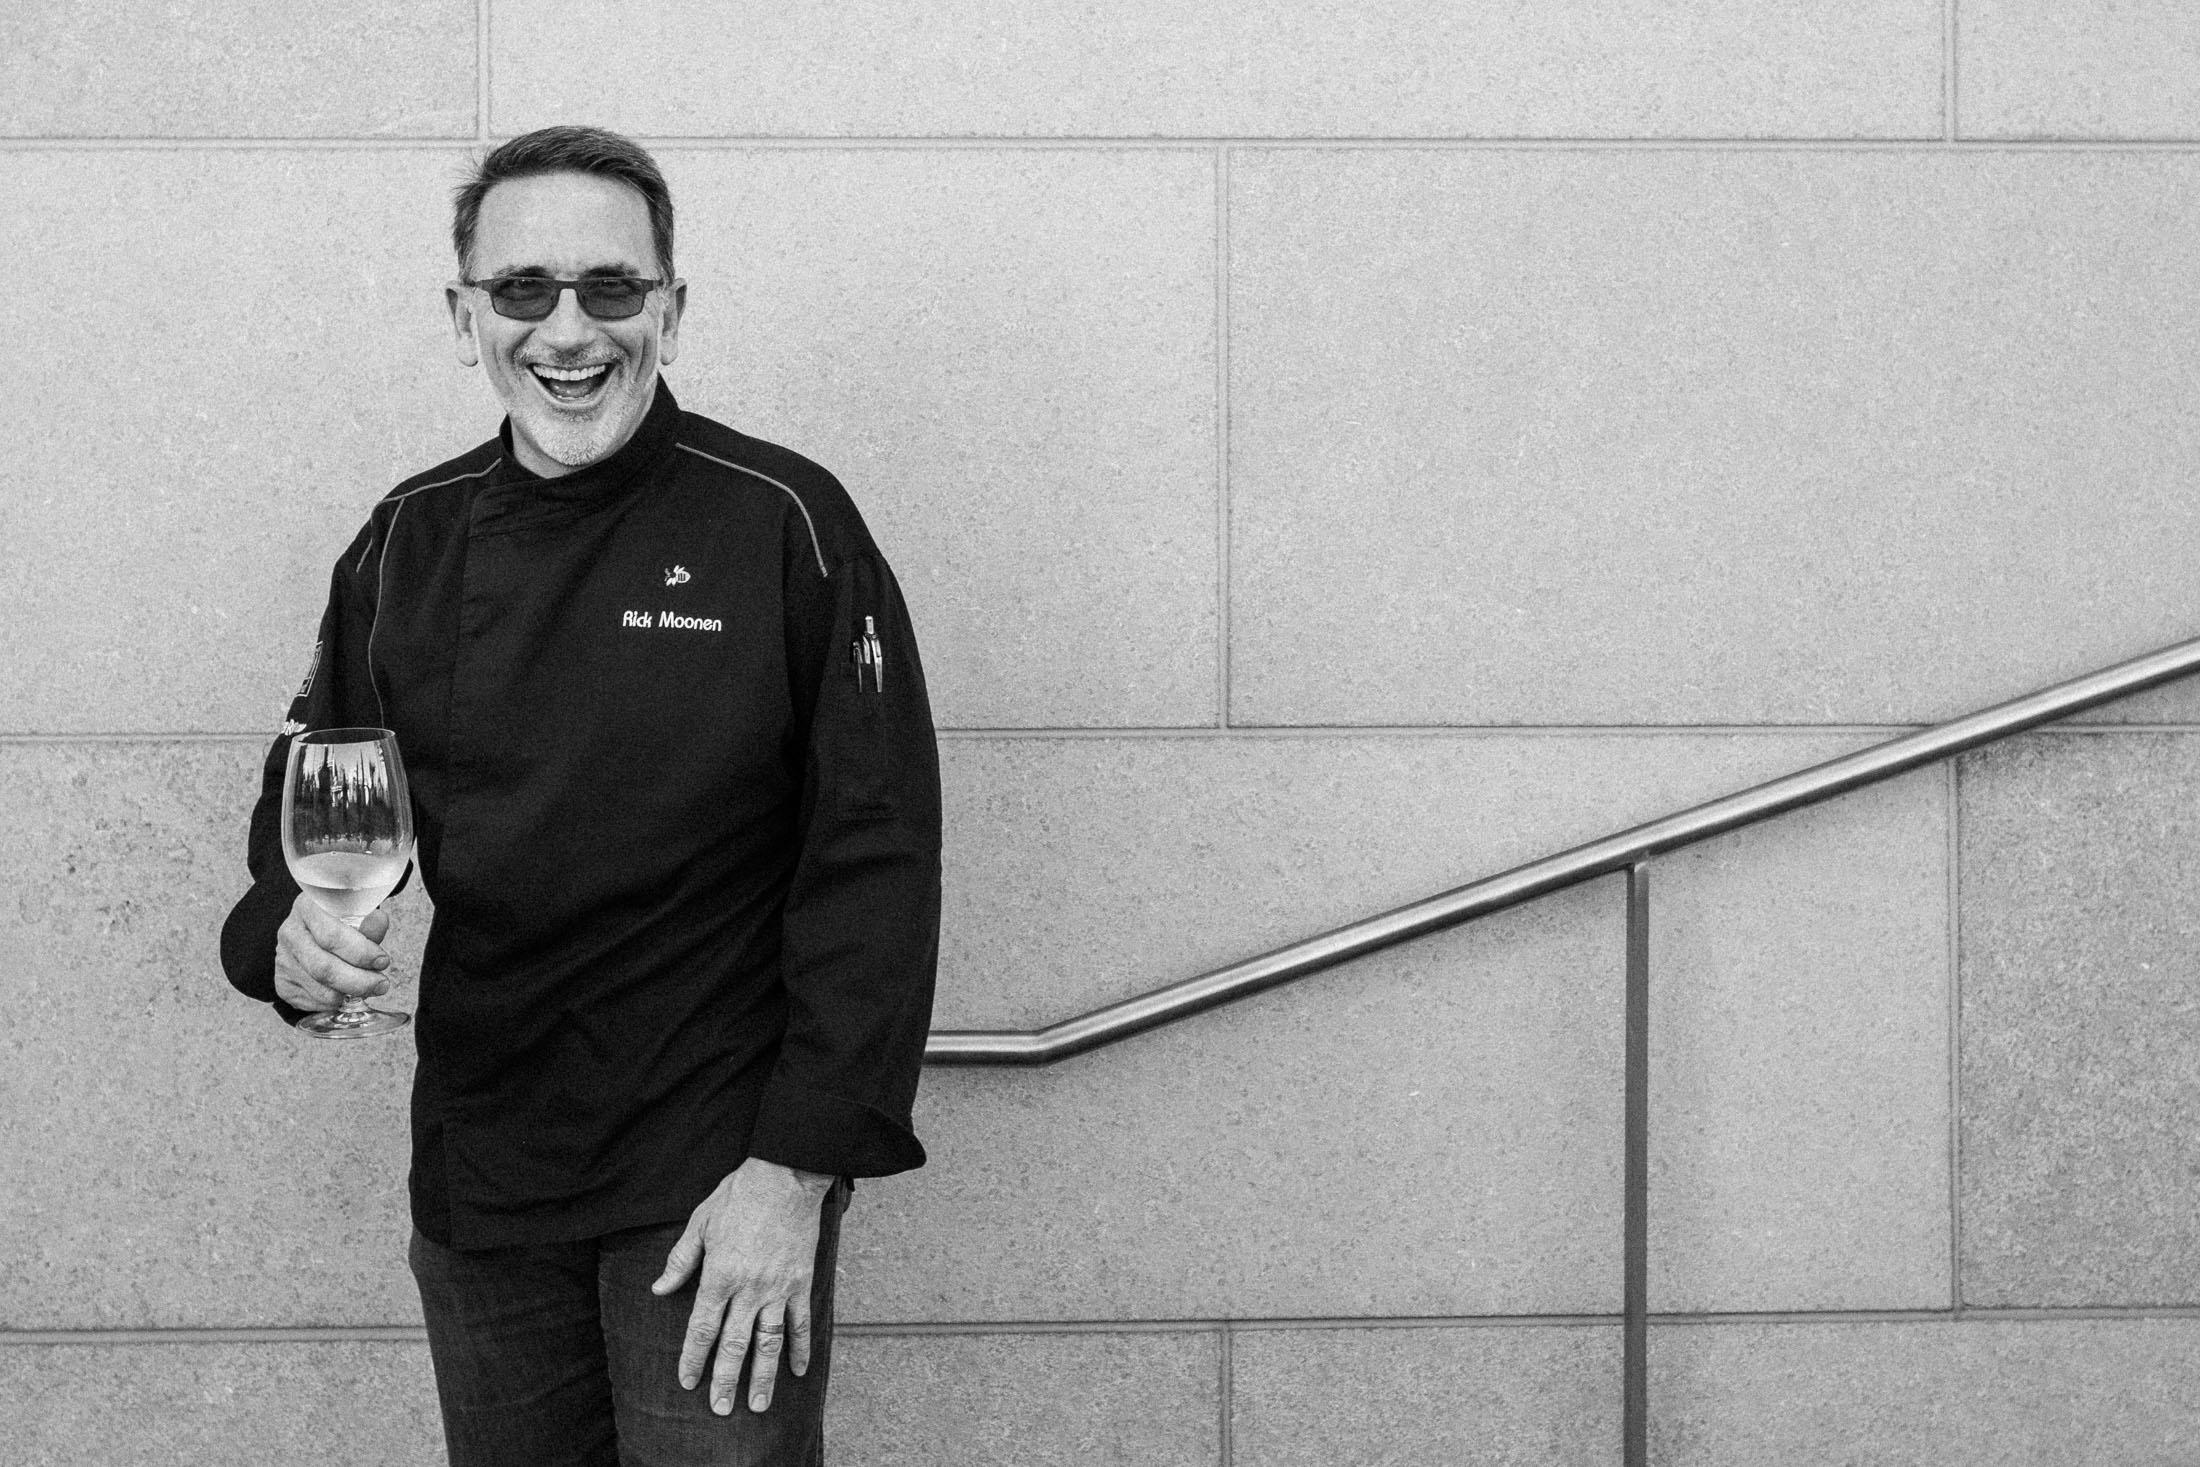 10. Chef Rick Moonen /RM Seafood /Las Vegas, Nevada